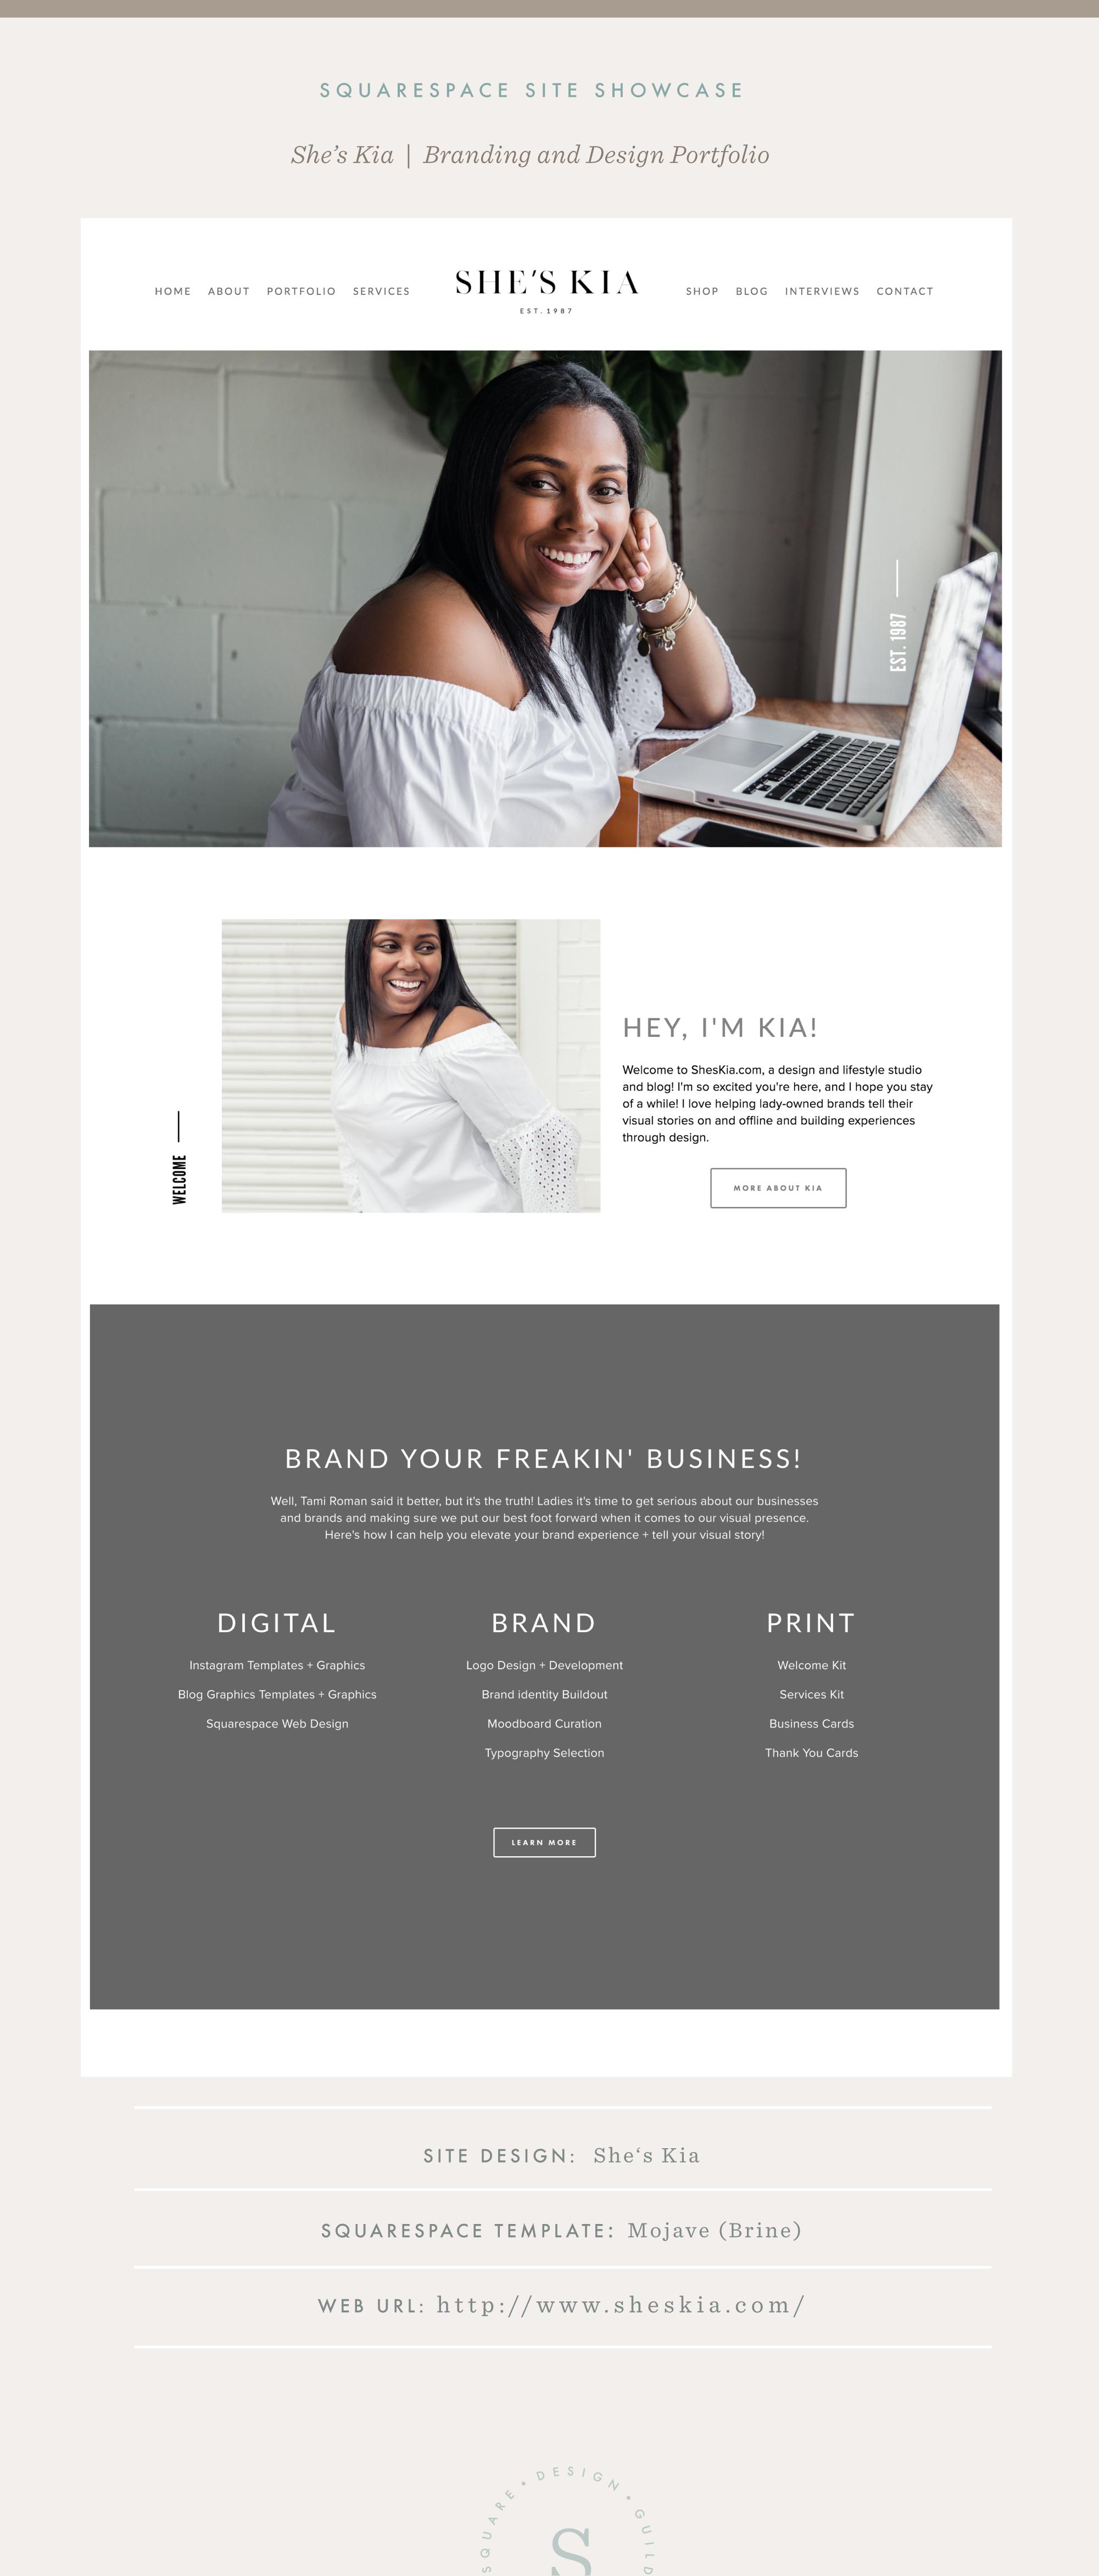 Squarespace Site Showcase | She's Kia | Brine Template